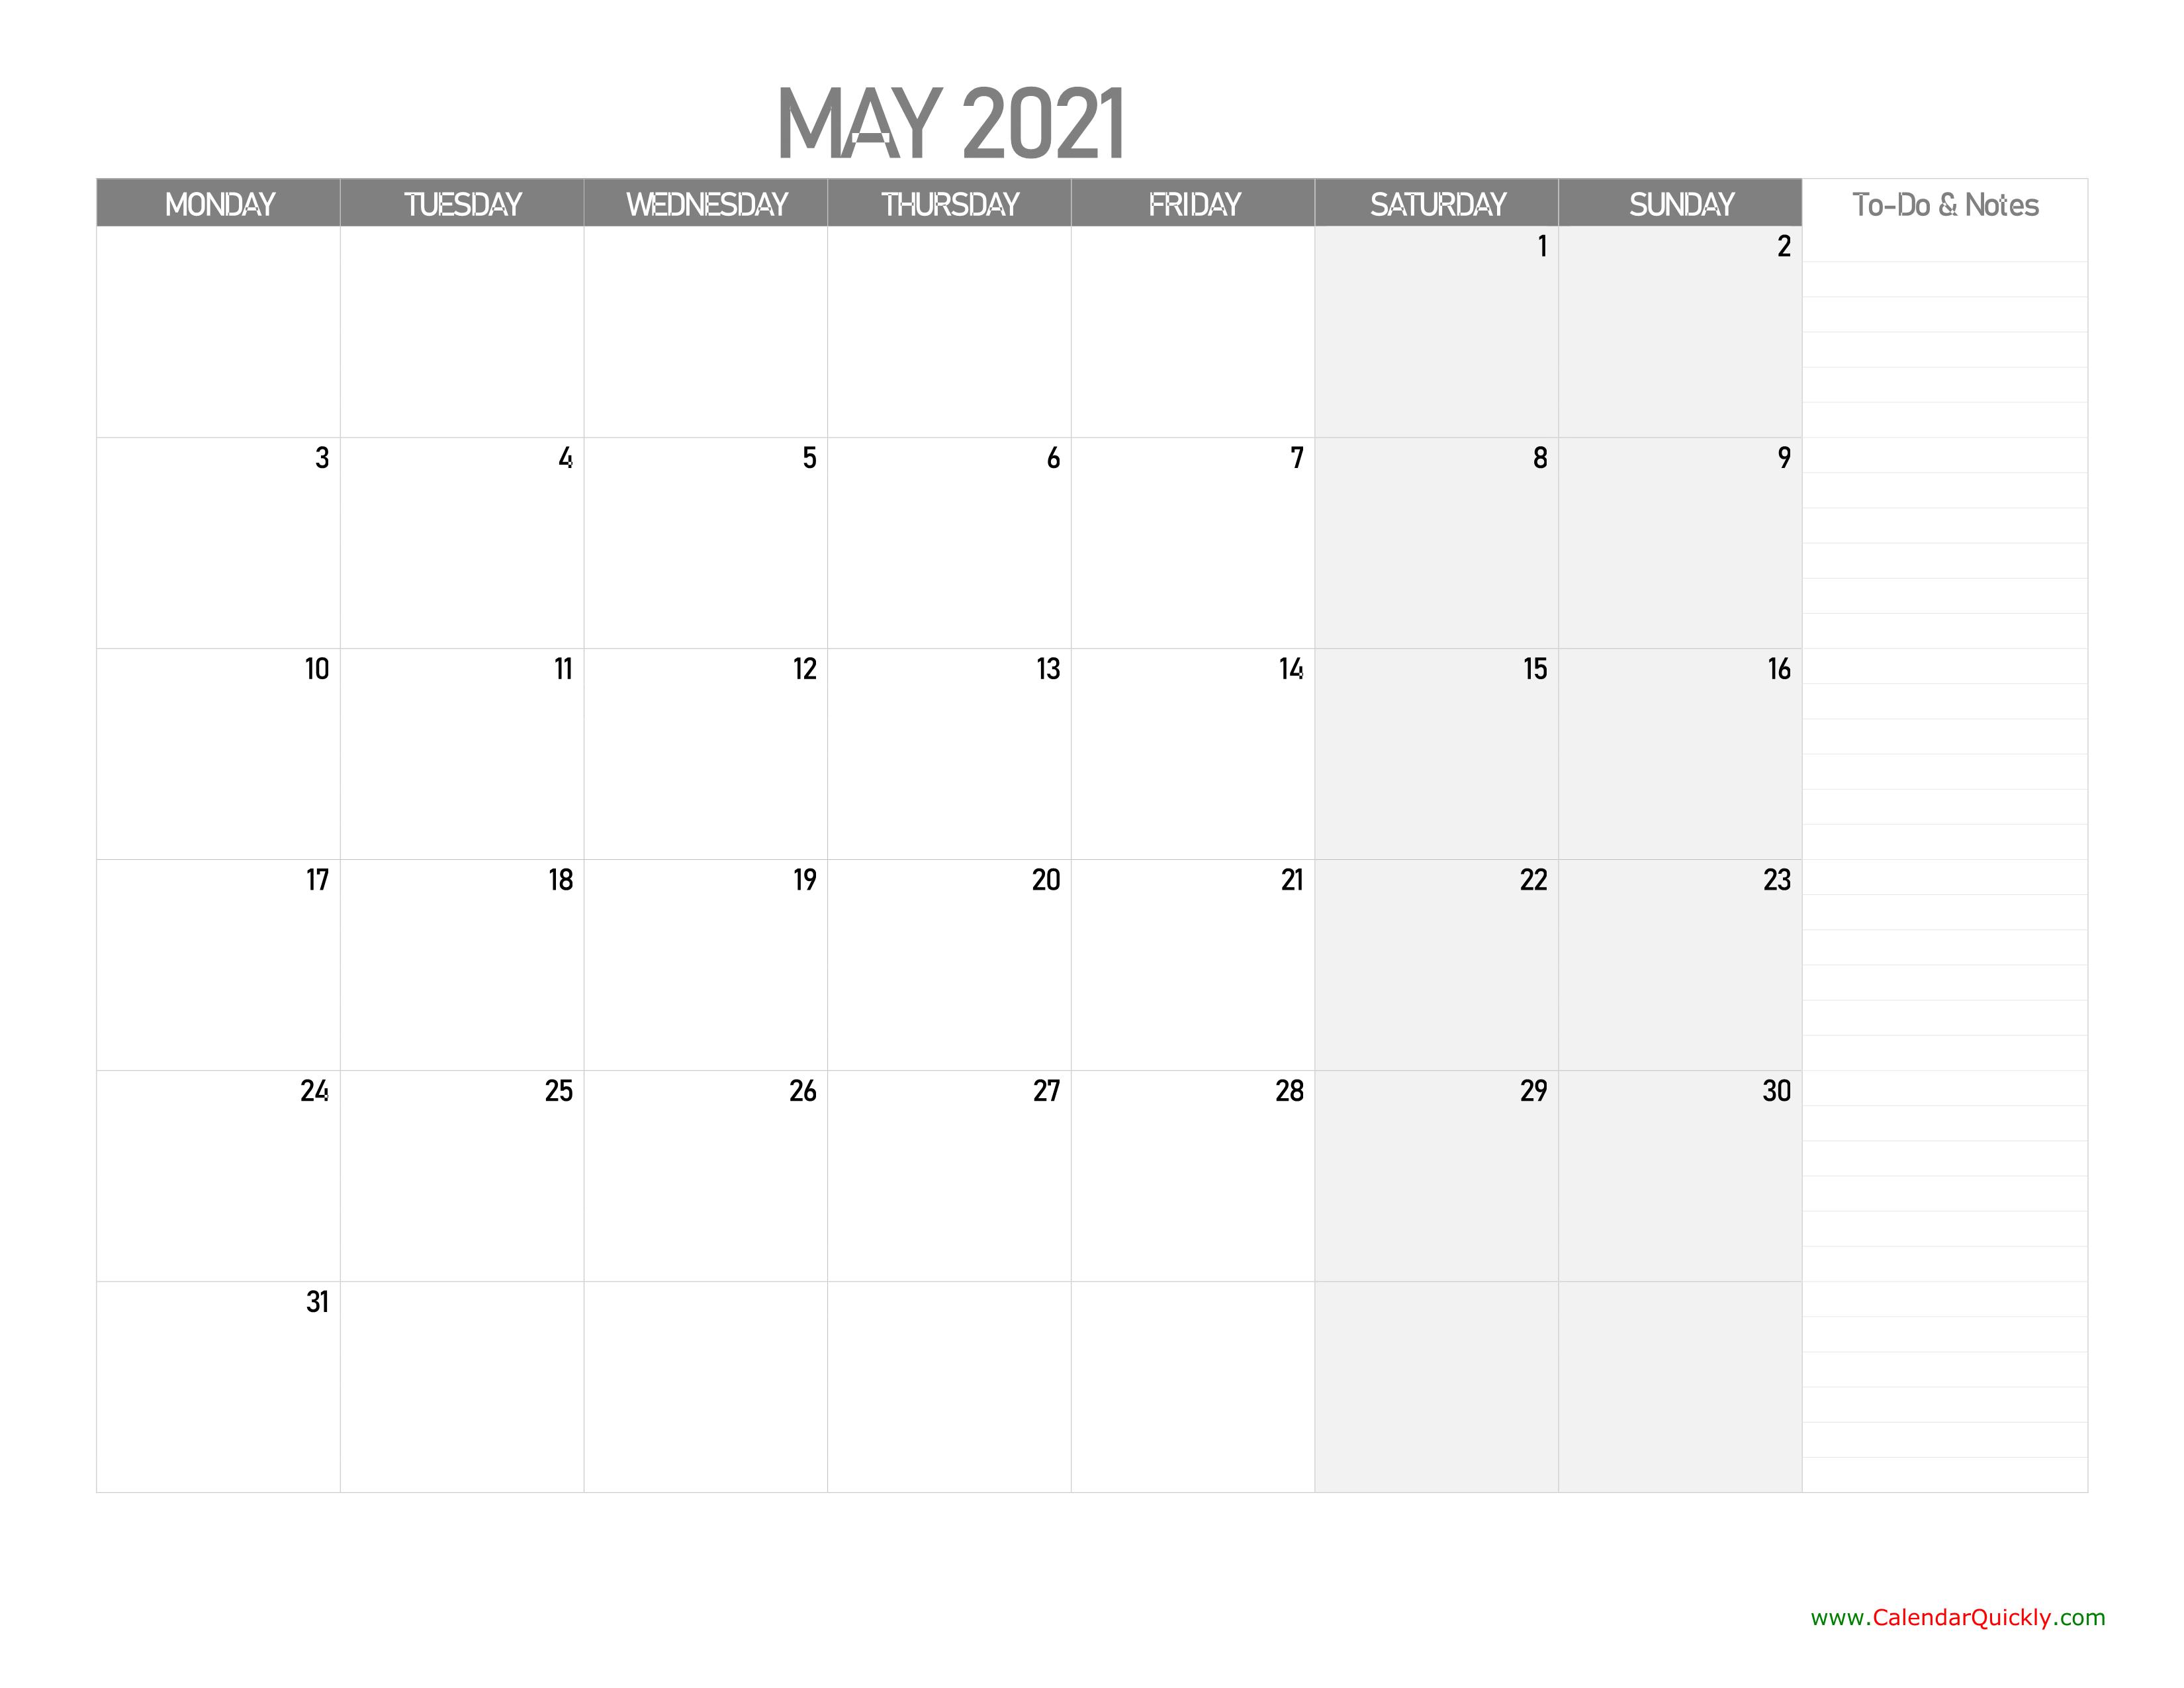 May Monday Calendar 2021 with Notes   Calendar Quickly